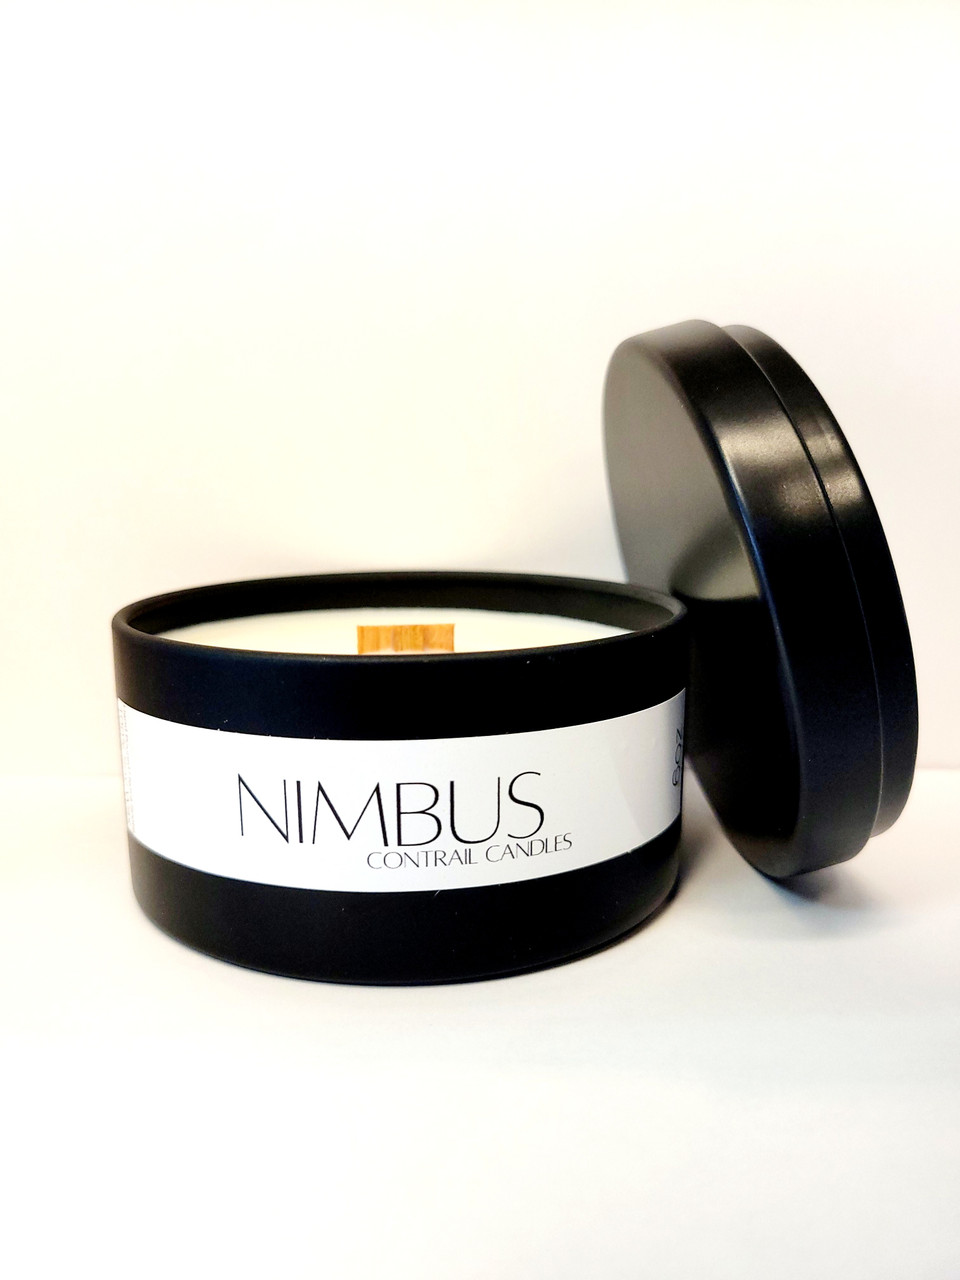 Contrail Candles - Nimbus Scent - 6oz